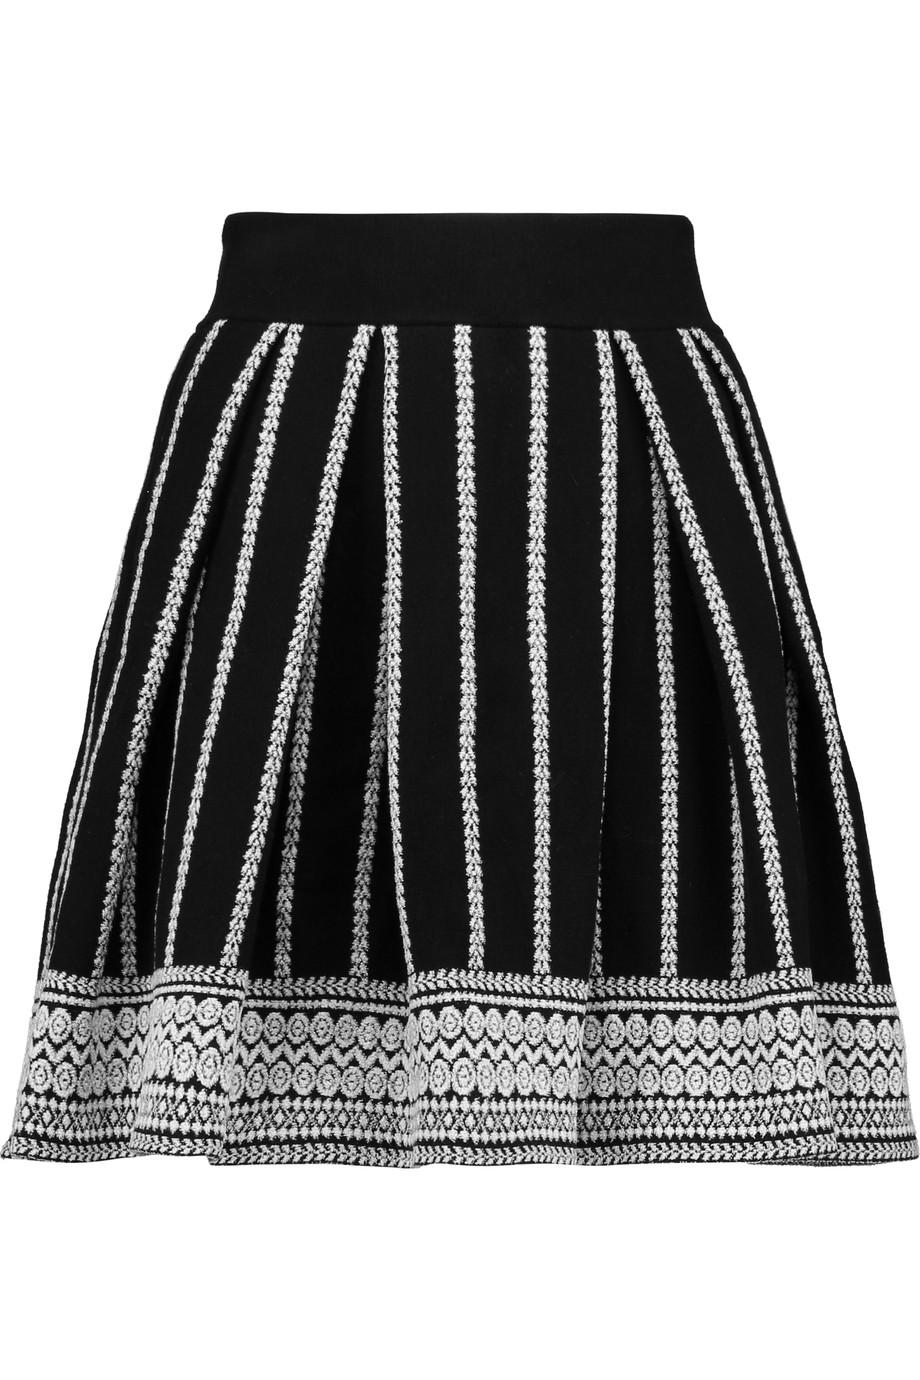 Maje mini skirt.jpg